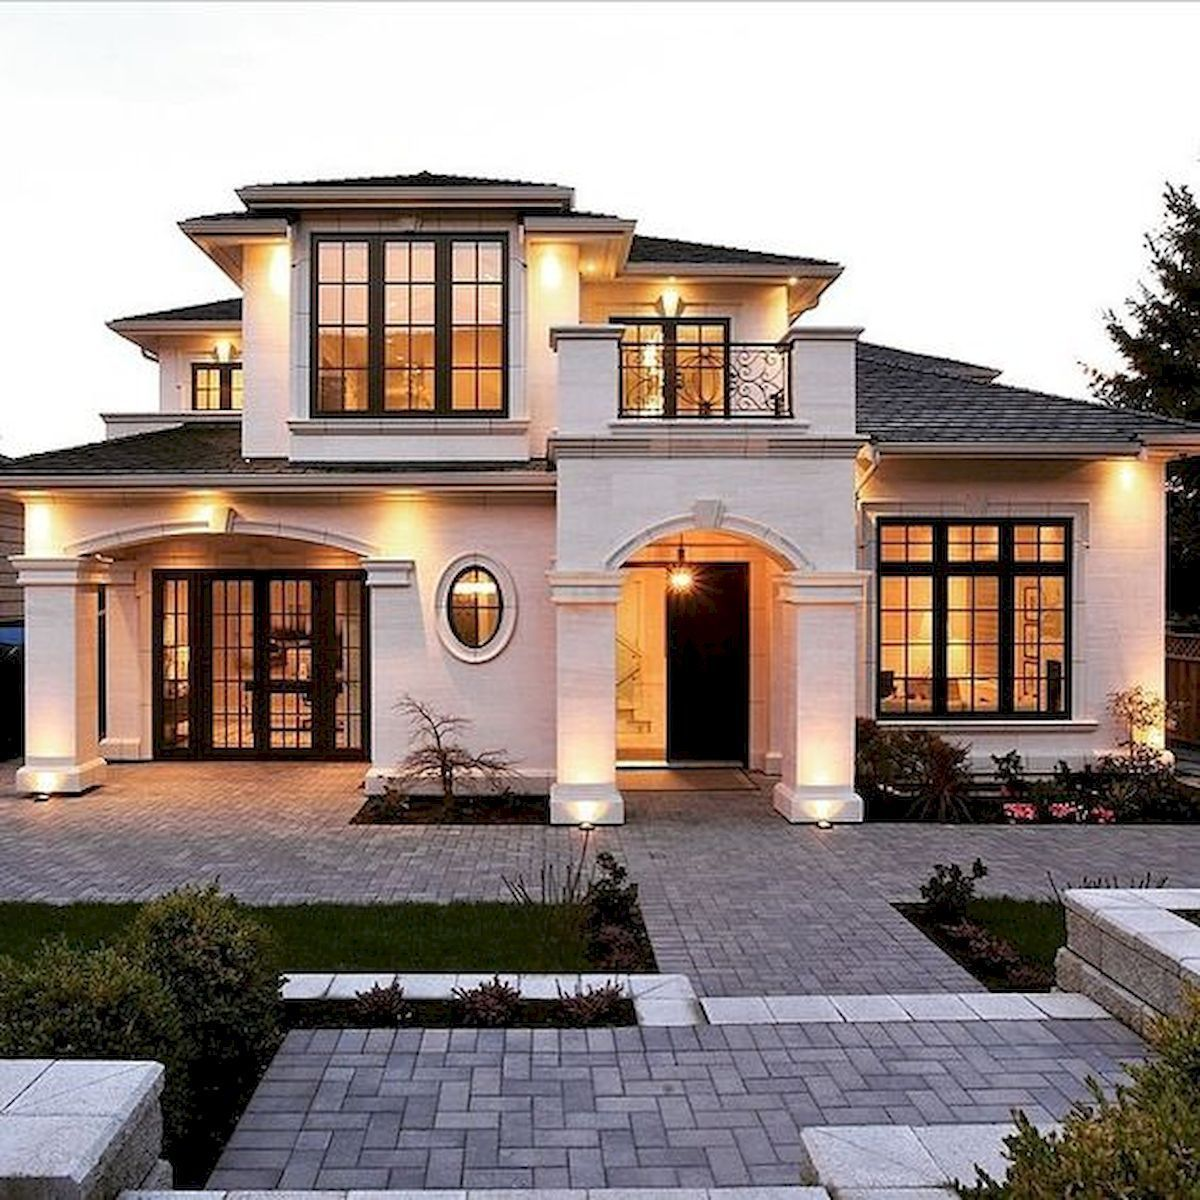 60 most popular modern dream house exterior design ideas on most popular modern dream house exterior design ideas the best destination id=96232